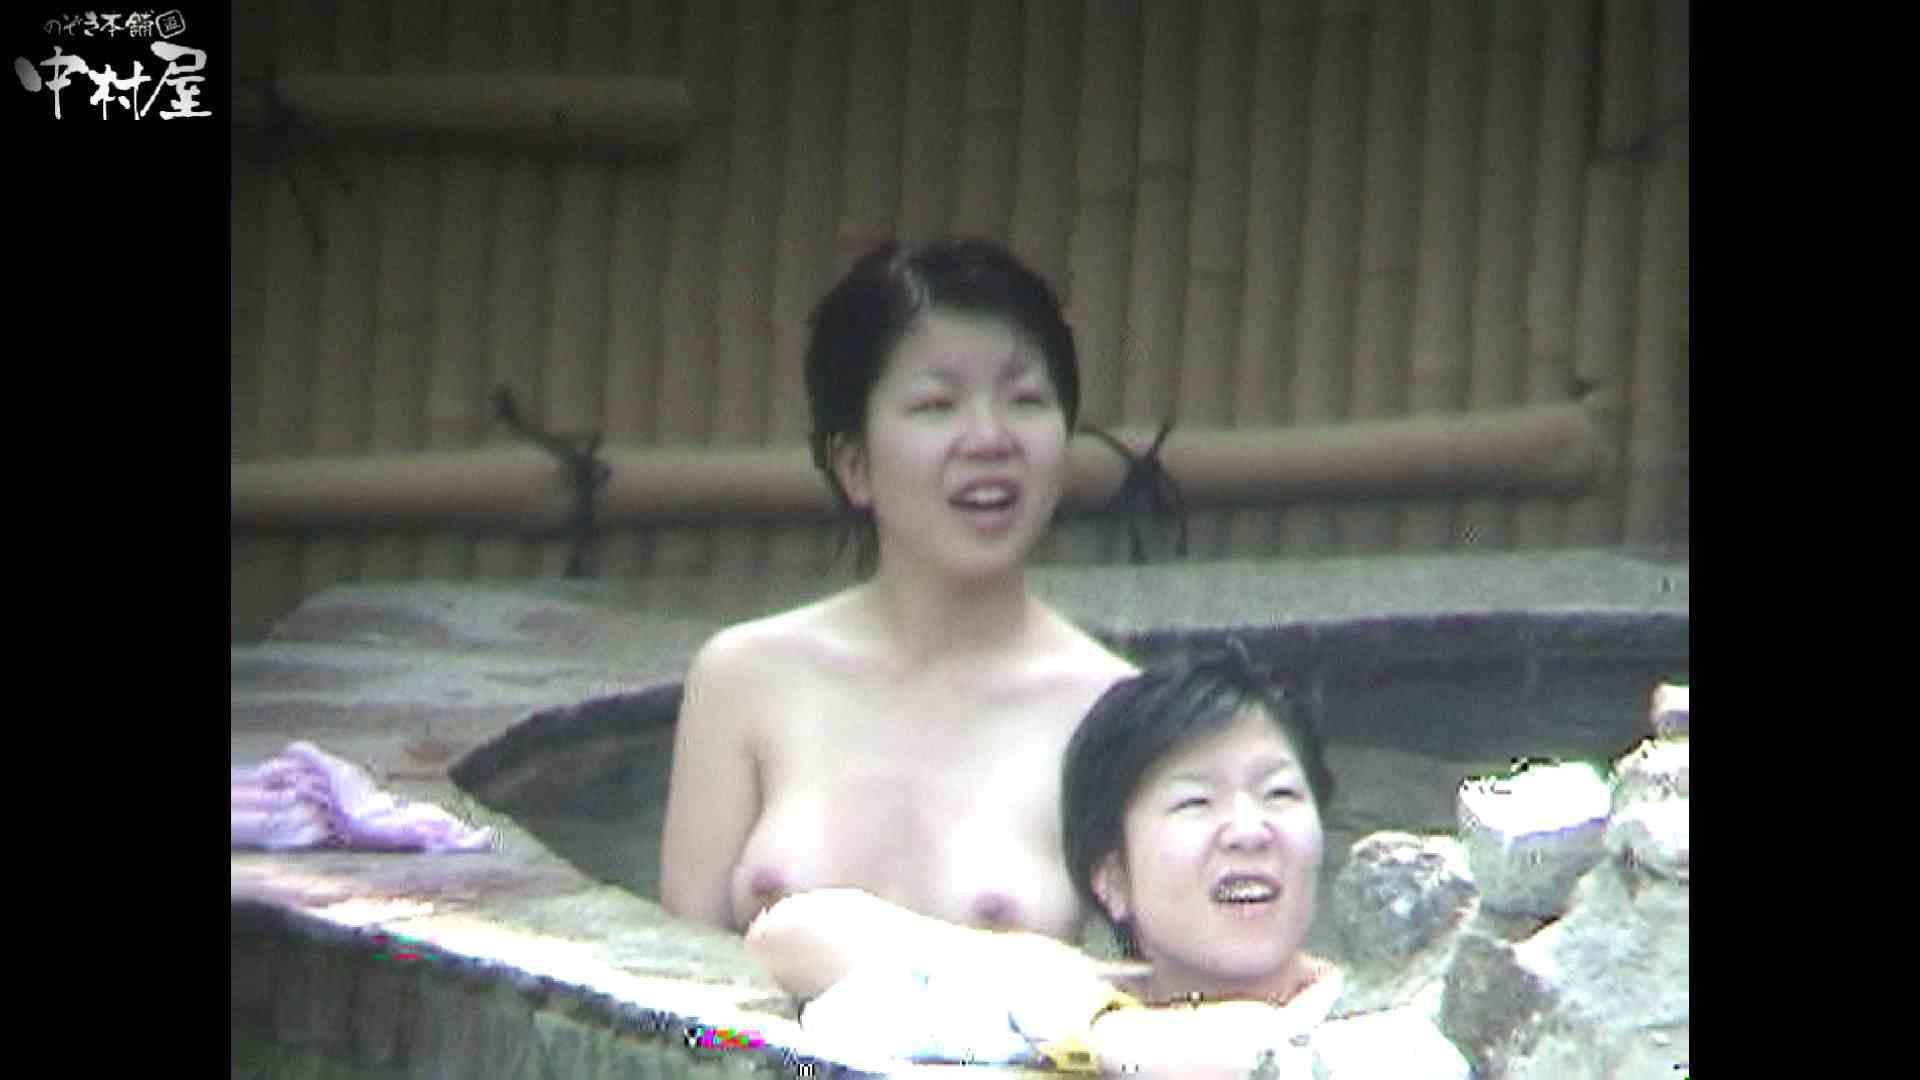 Aquaな露天風呂Vol.936 盗撮映像  110Pix 5